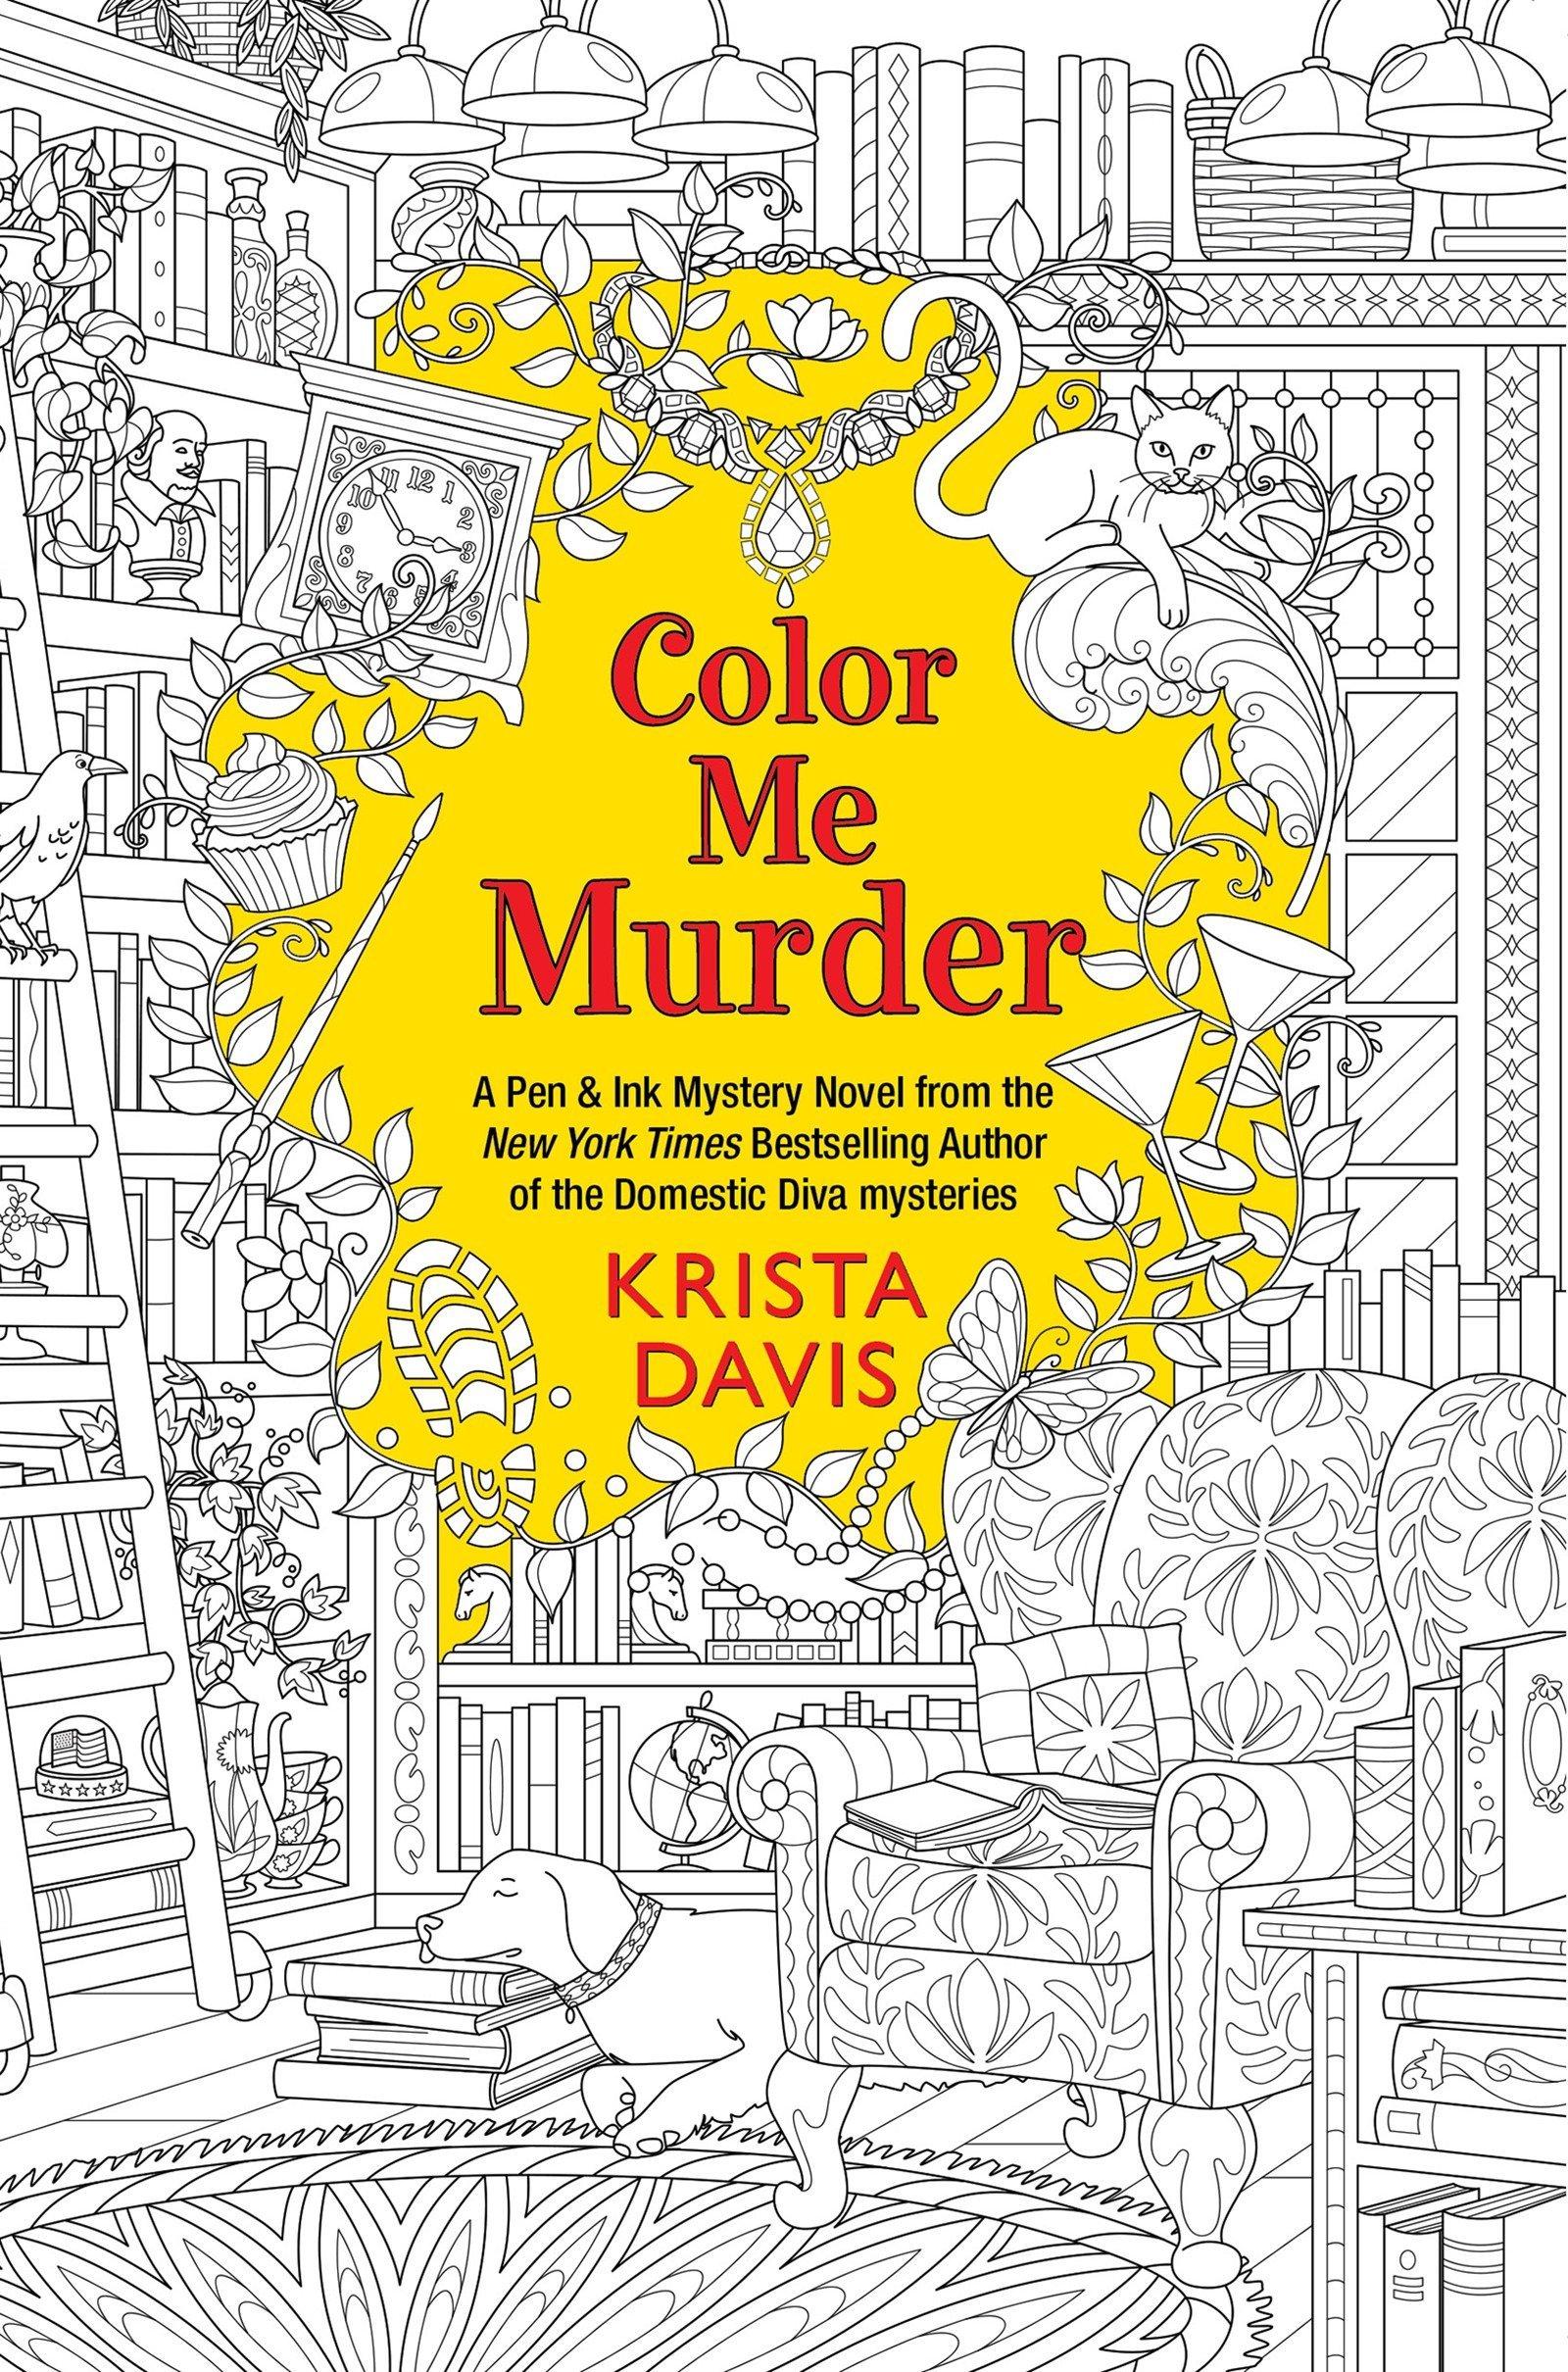 Amazon Color Me Murder Pen Ink 9781496716408 Krista Davis Books